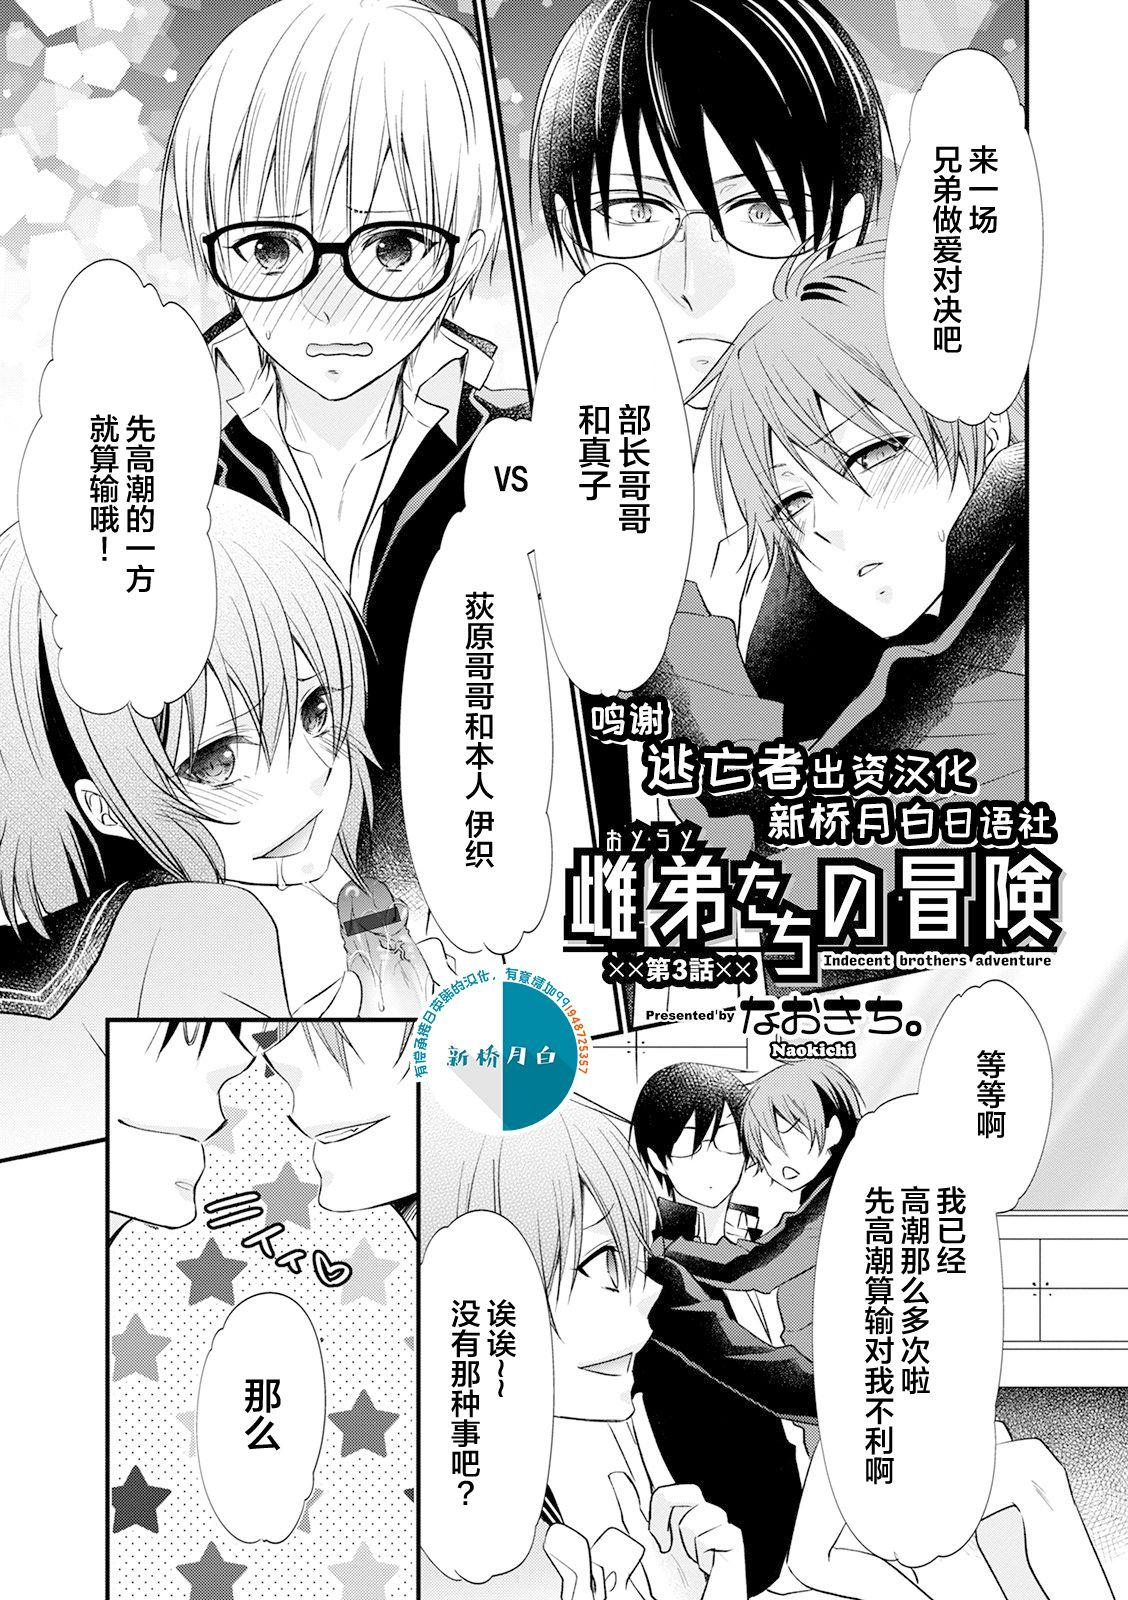 [Naokichi.] Otouto-tachi no Bouken - Indecent brothers adventure Ch. 1-3 [Chinese] [逃亡者×新桥月白日语社] [Digital] 24